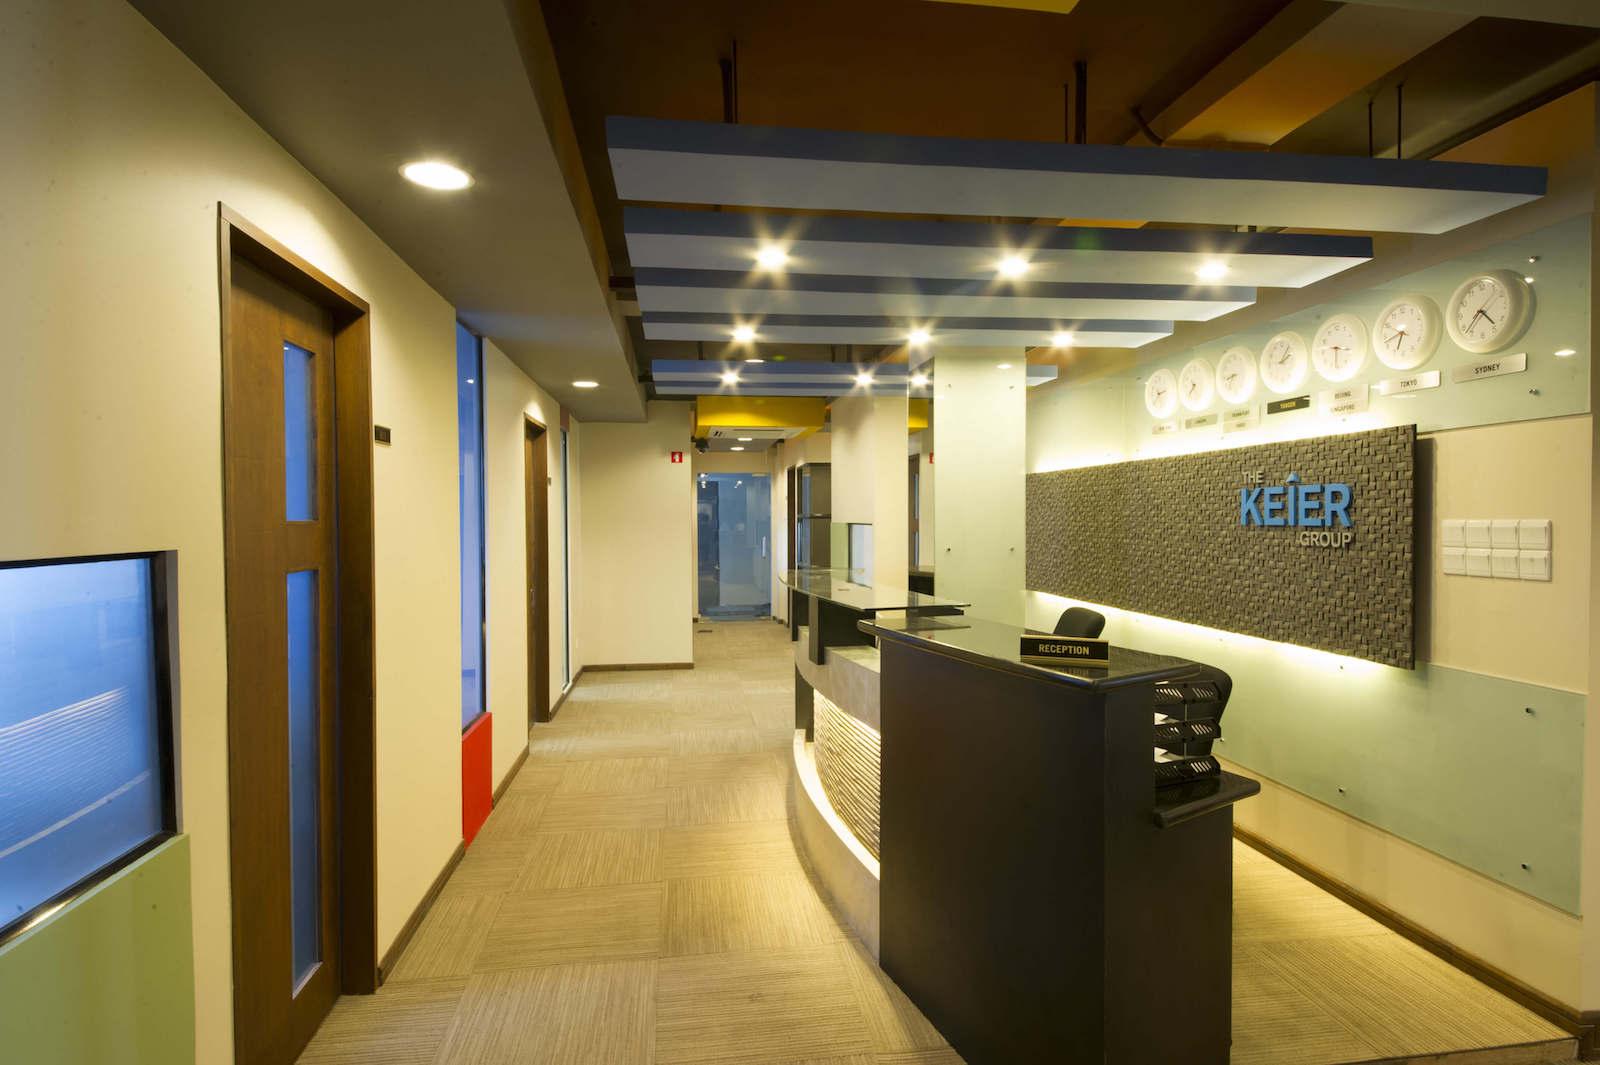 Keier Business Centre, Yangon